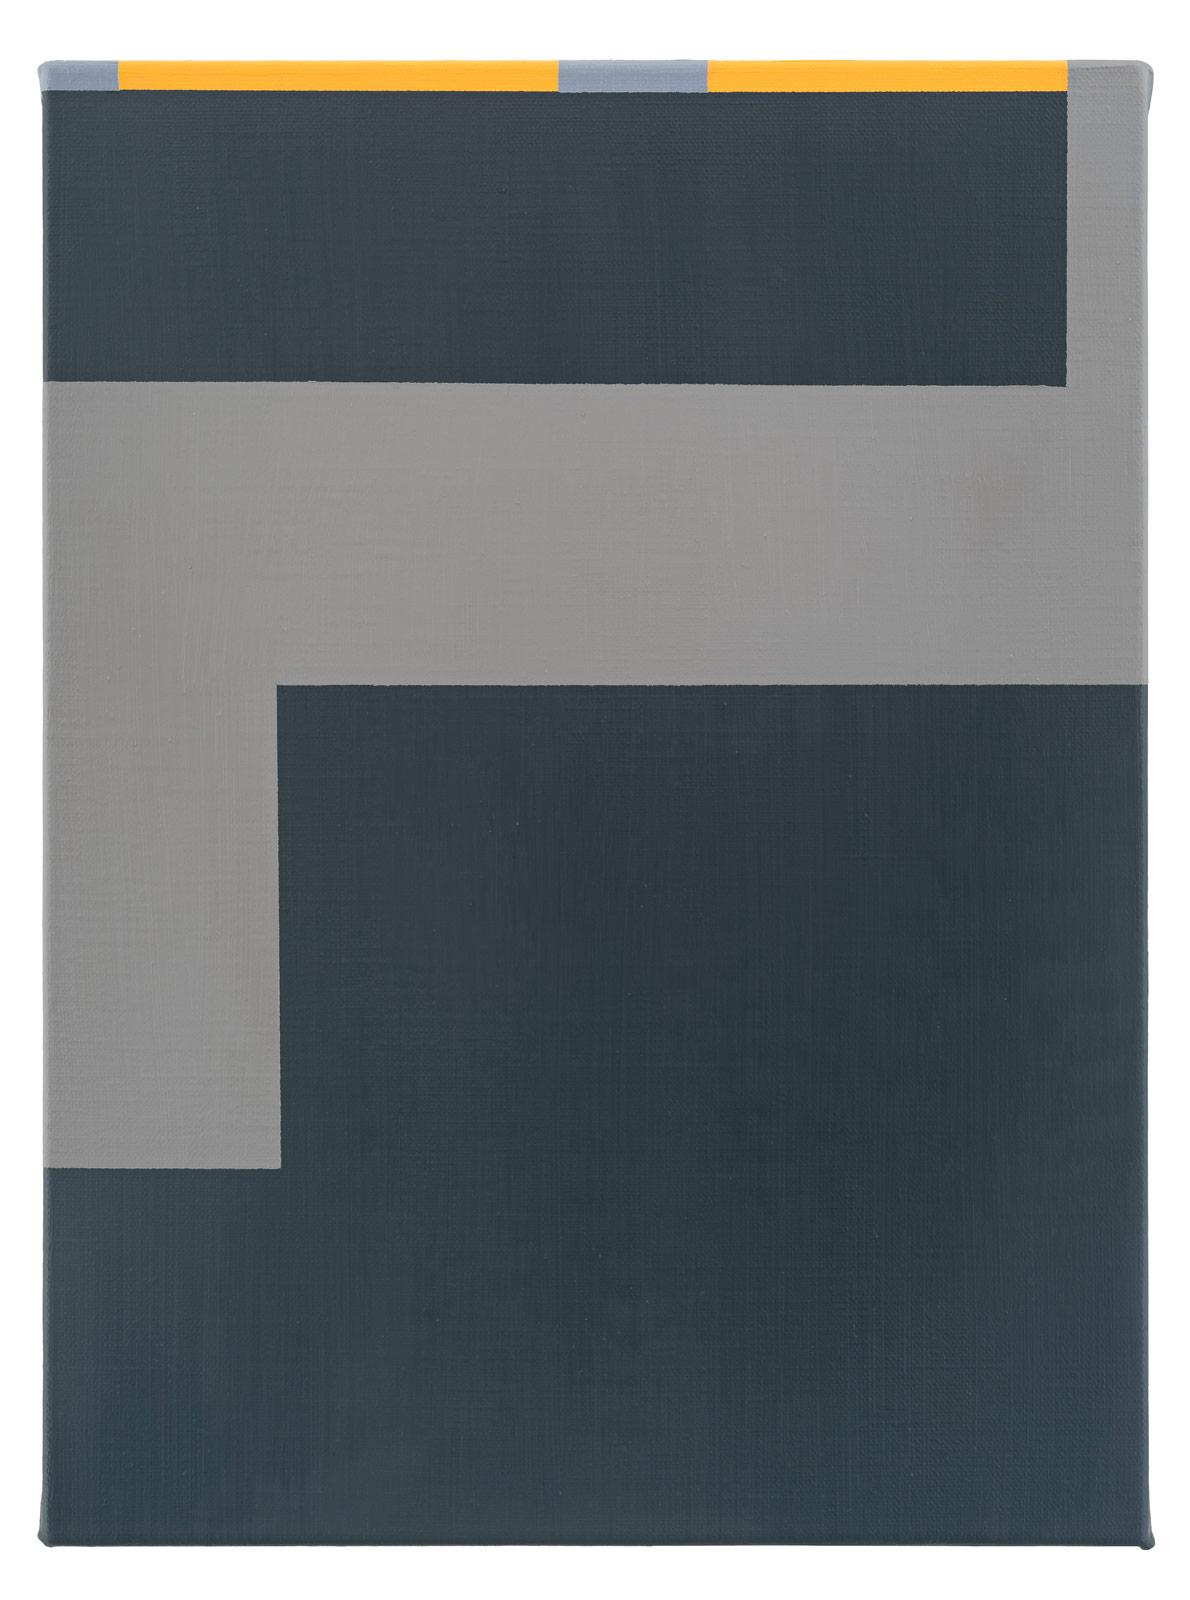 Vägen, 2019. Oil on canvas, 38,5 x 28,5 x 2 cm